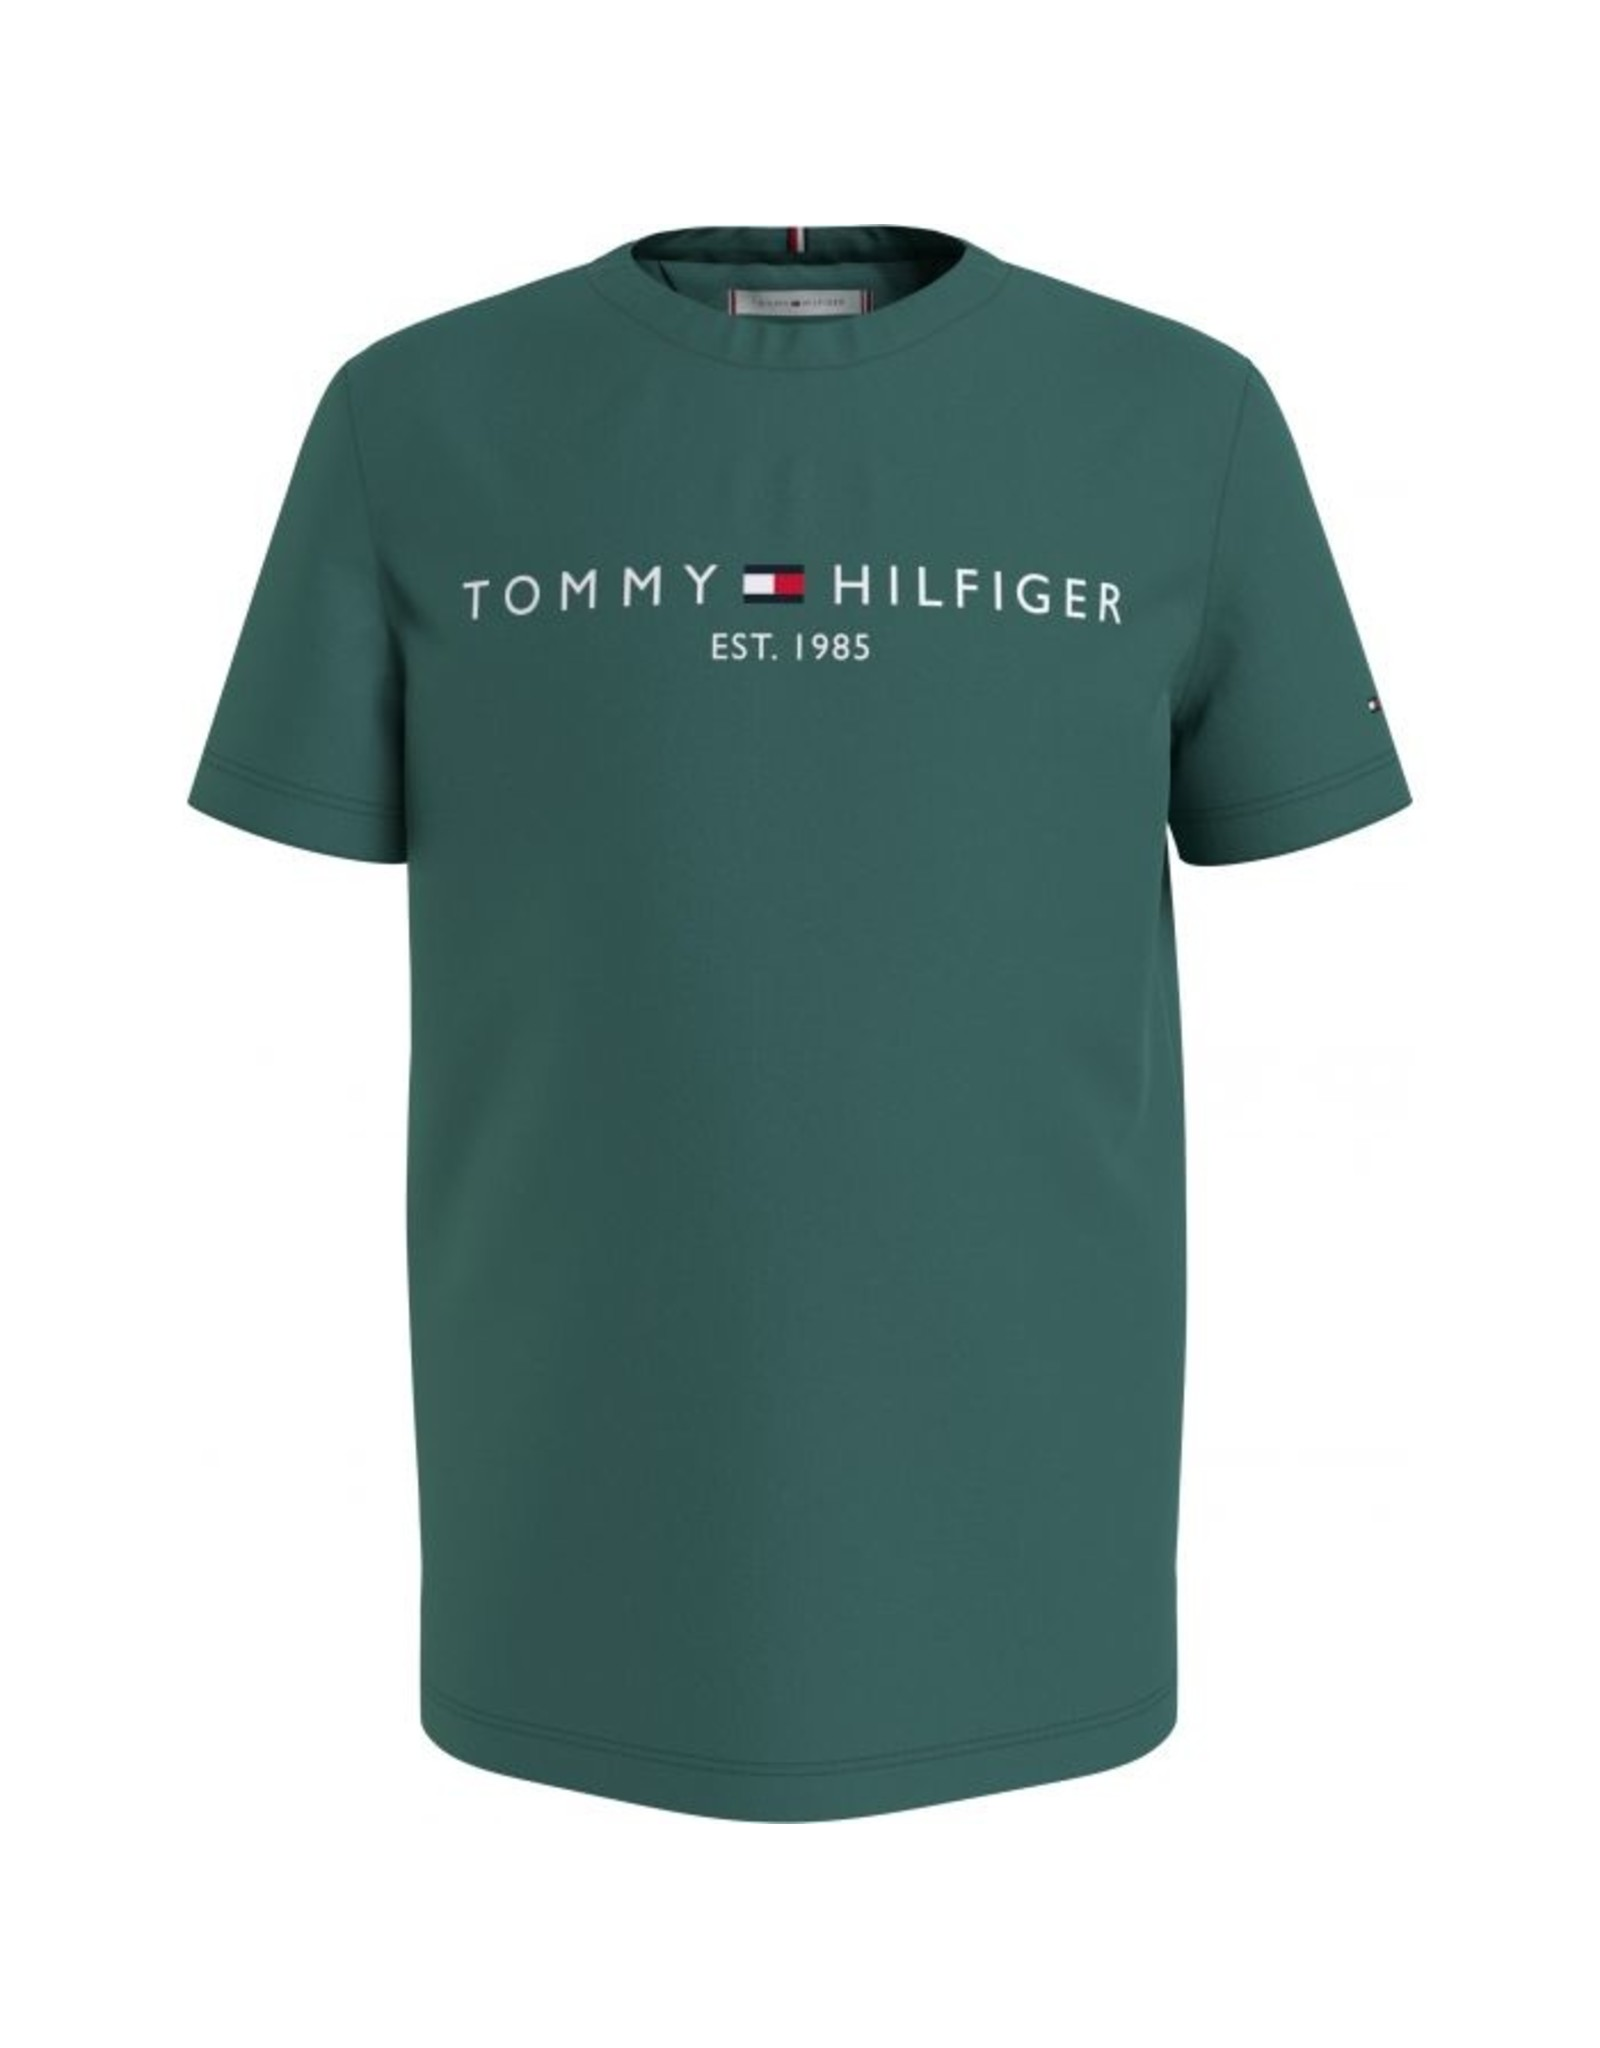 Tommy Hilfiger 0201 T-Shirt